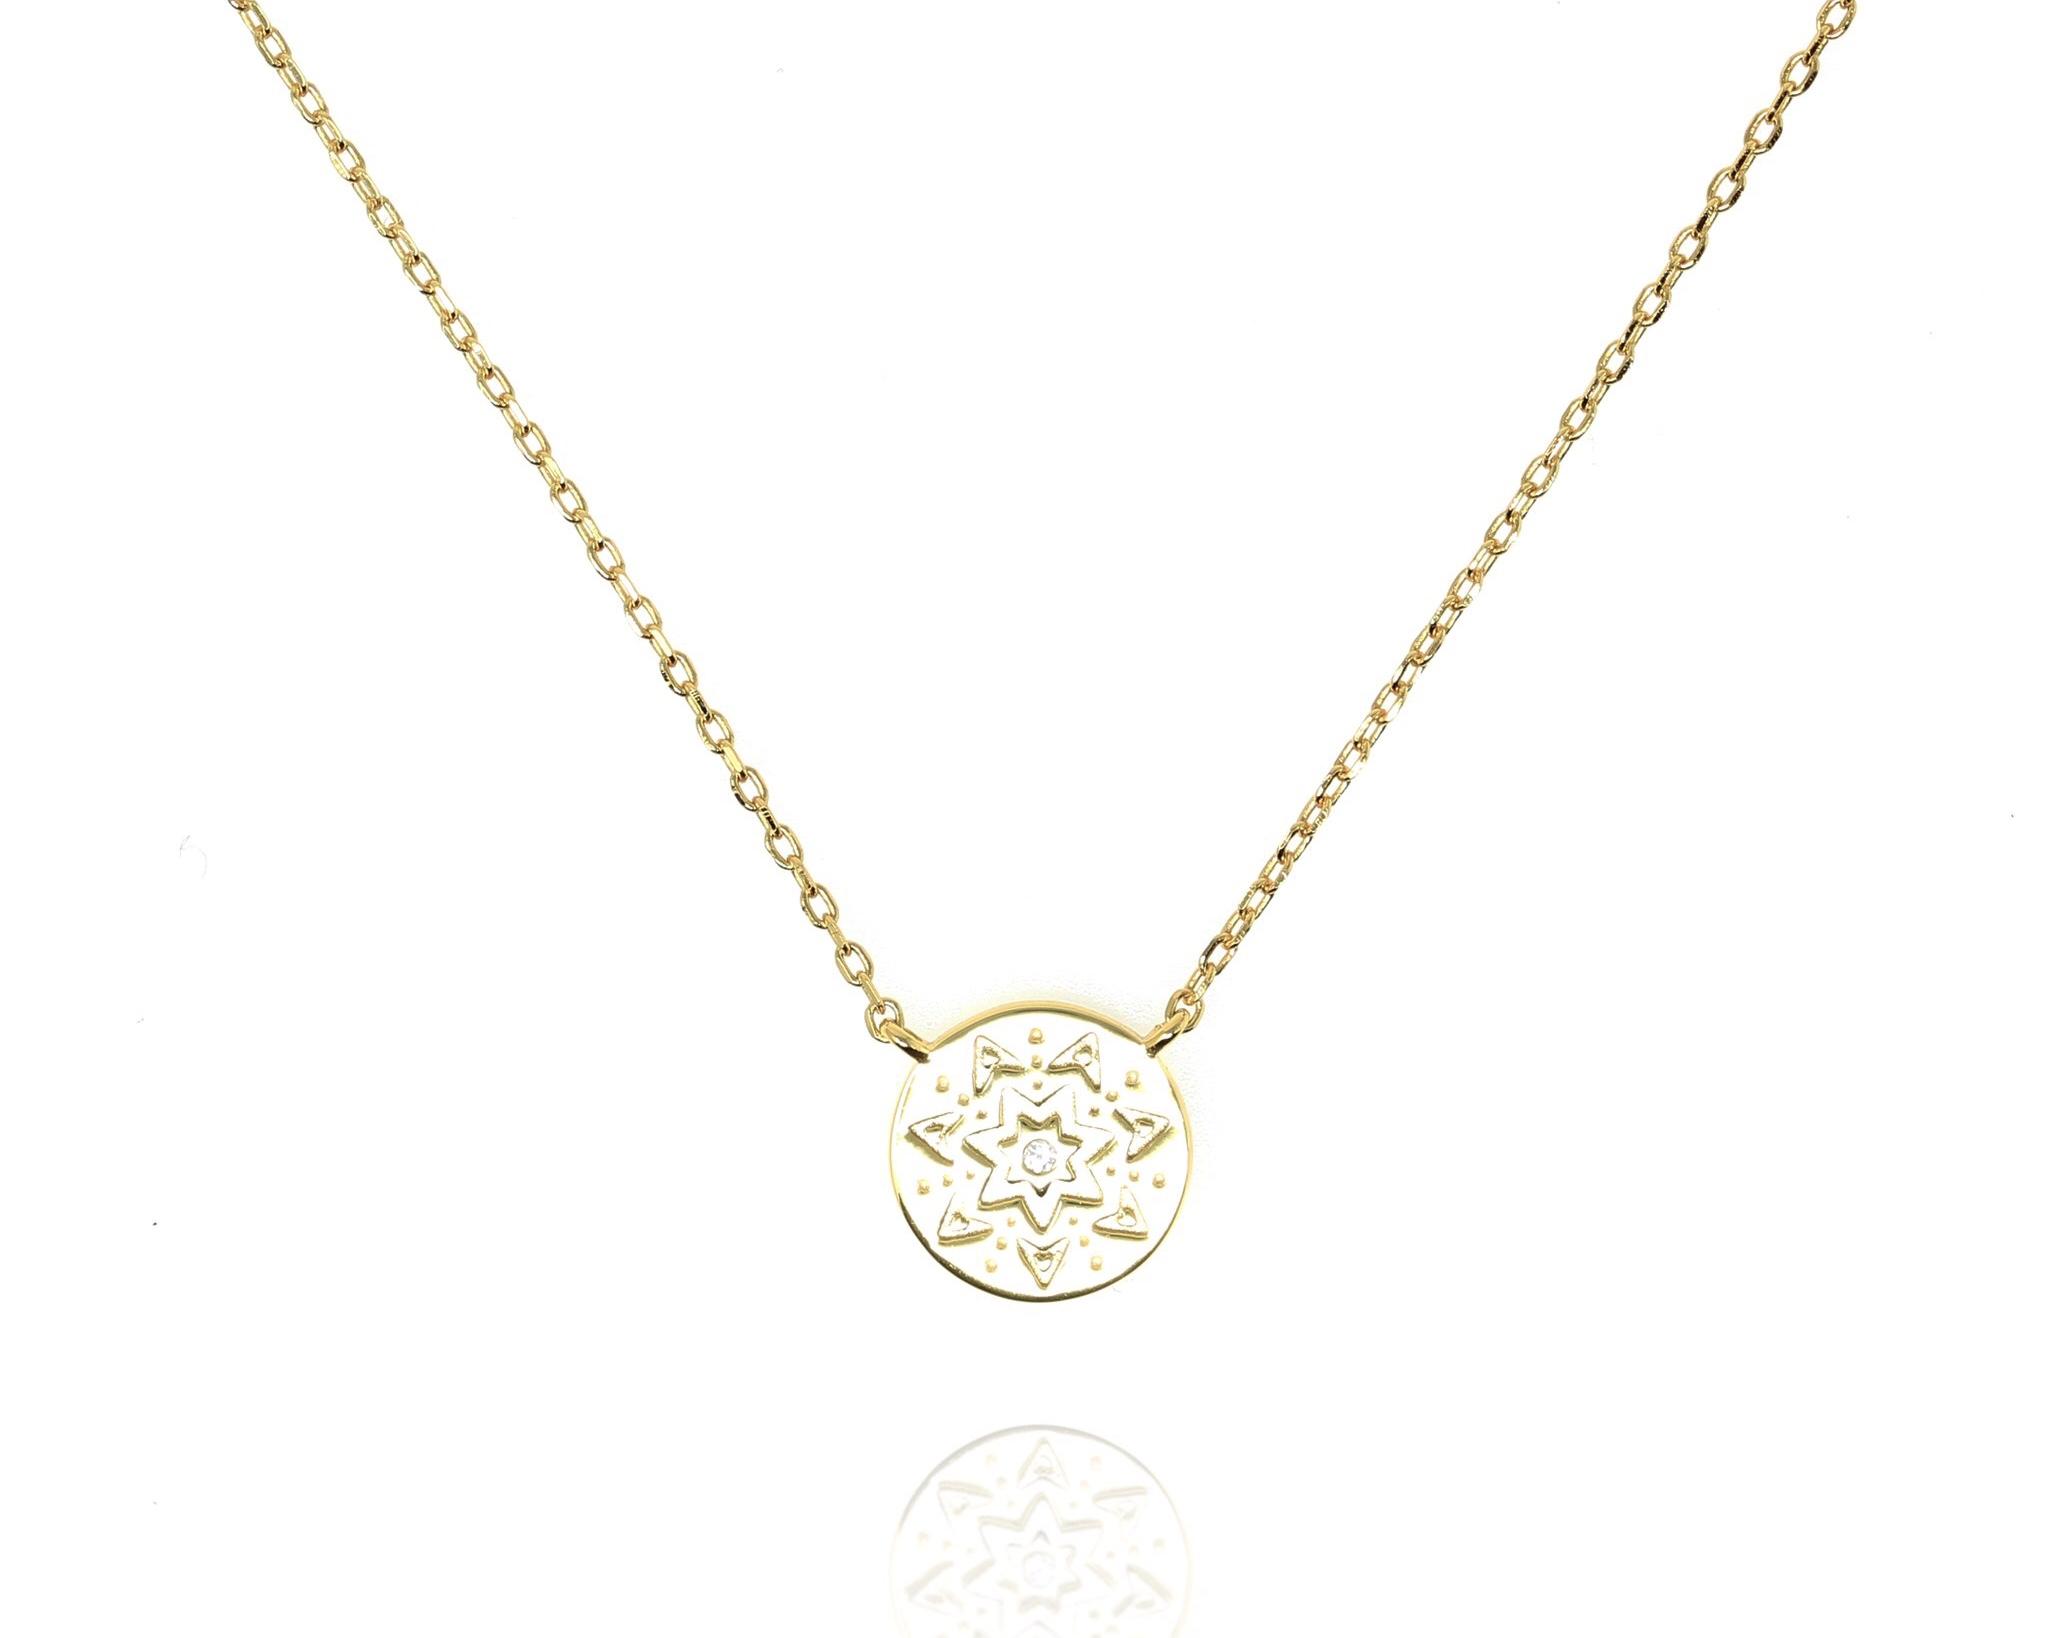 Sunburst Disc Bracelet - Gold Plate on Sterling Silver